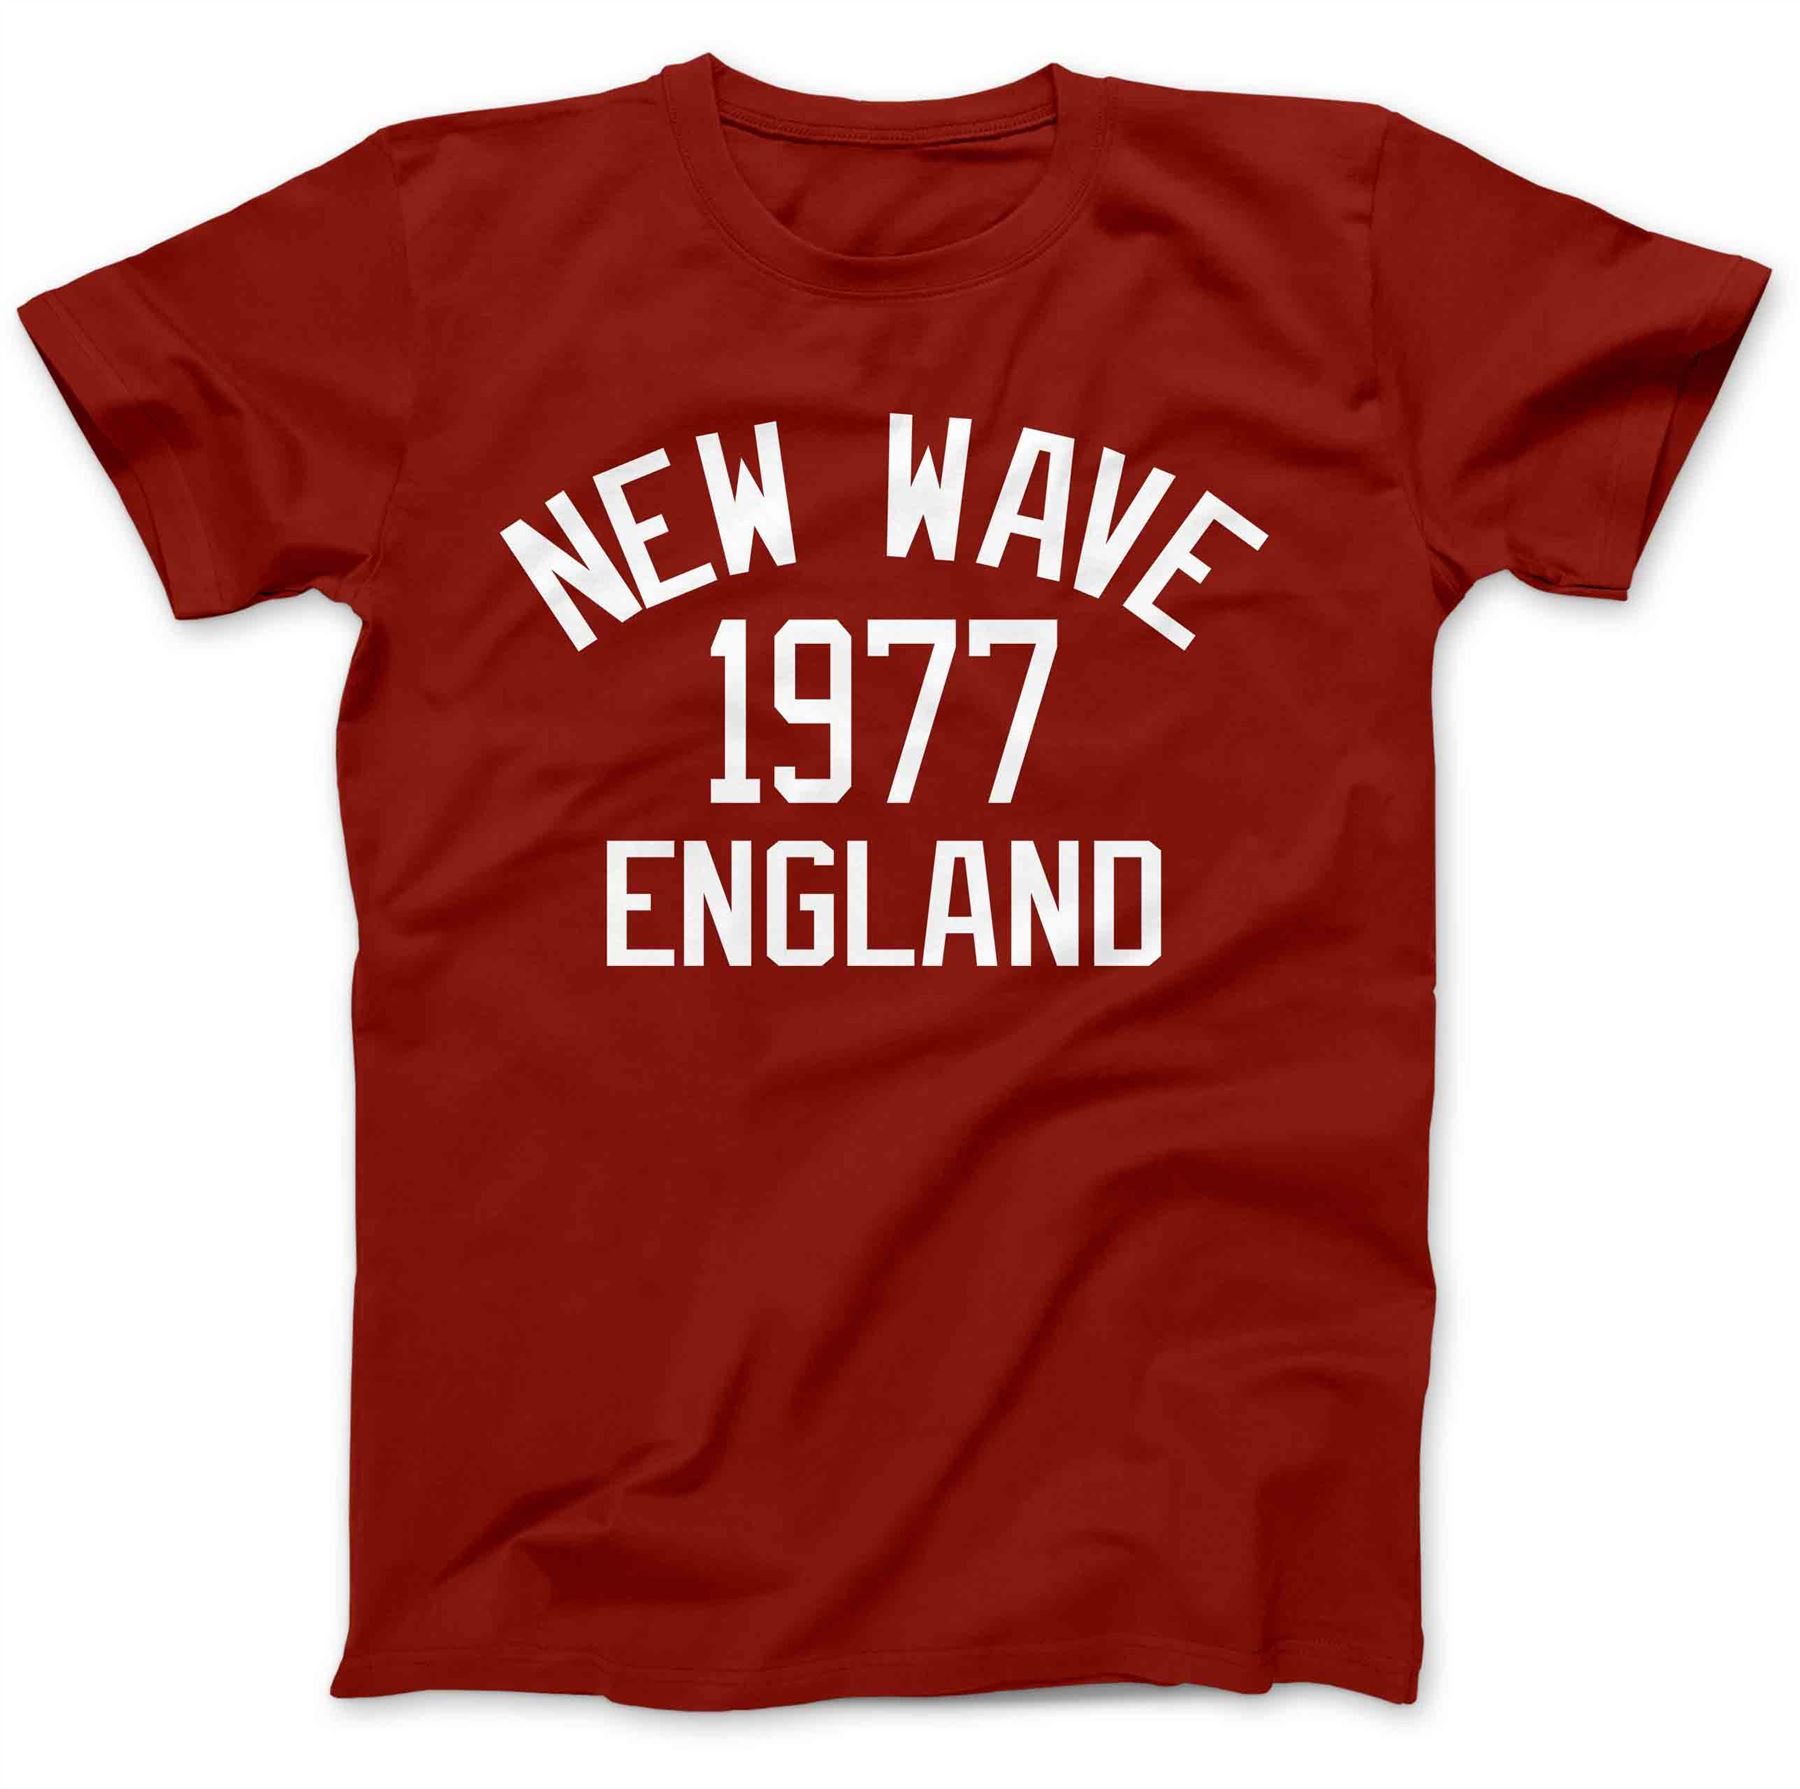 a40a3045 New Wave Music 1977 T-Shirt 100% Premium Cotton Post-Punk Rock ...